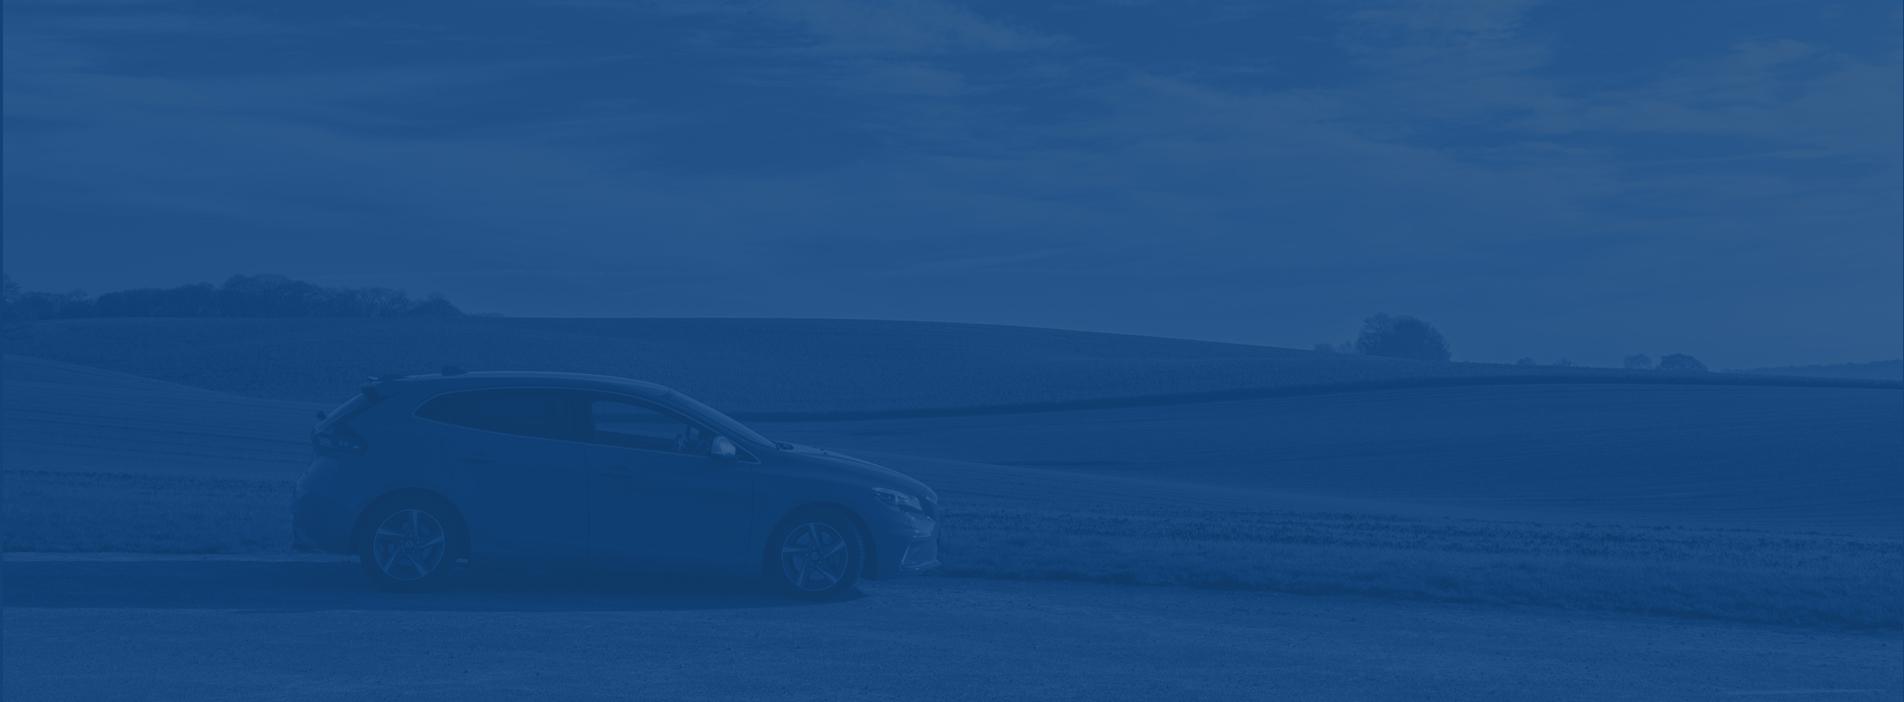 lp-car-image